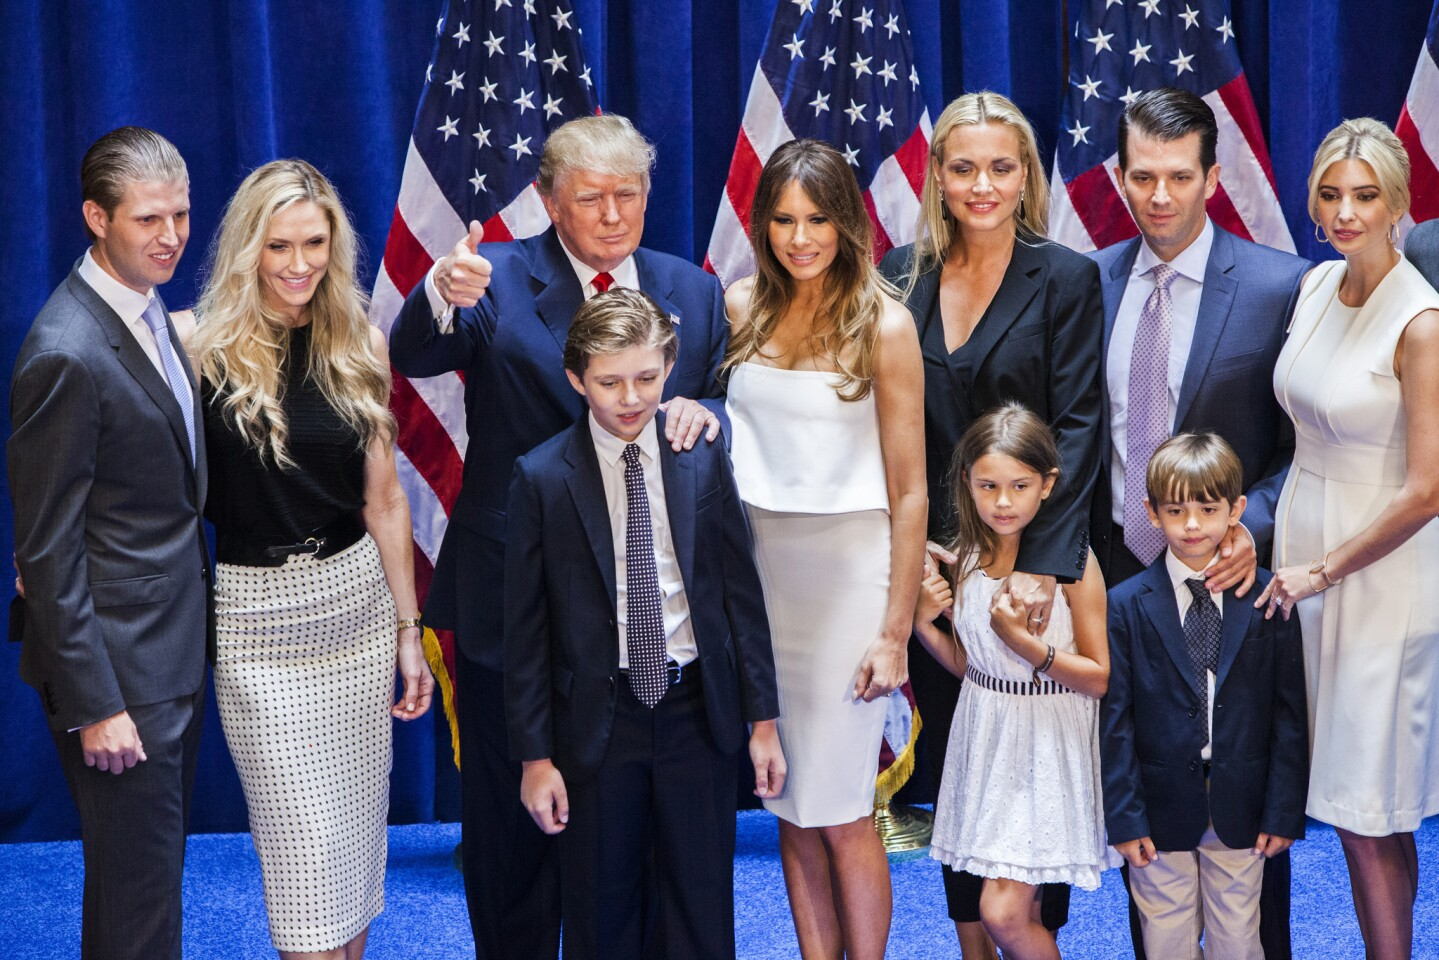 Eric Trump, left, Lara Yunaska Trump, Donald Trump, Barron Trump, Melania Trump, Vanessa Haydon Trump, Kai Madison Trump, Donald Trump Jr., Donald John Trump III and Ivanka Trump.